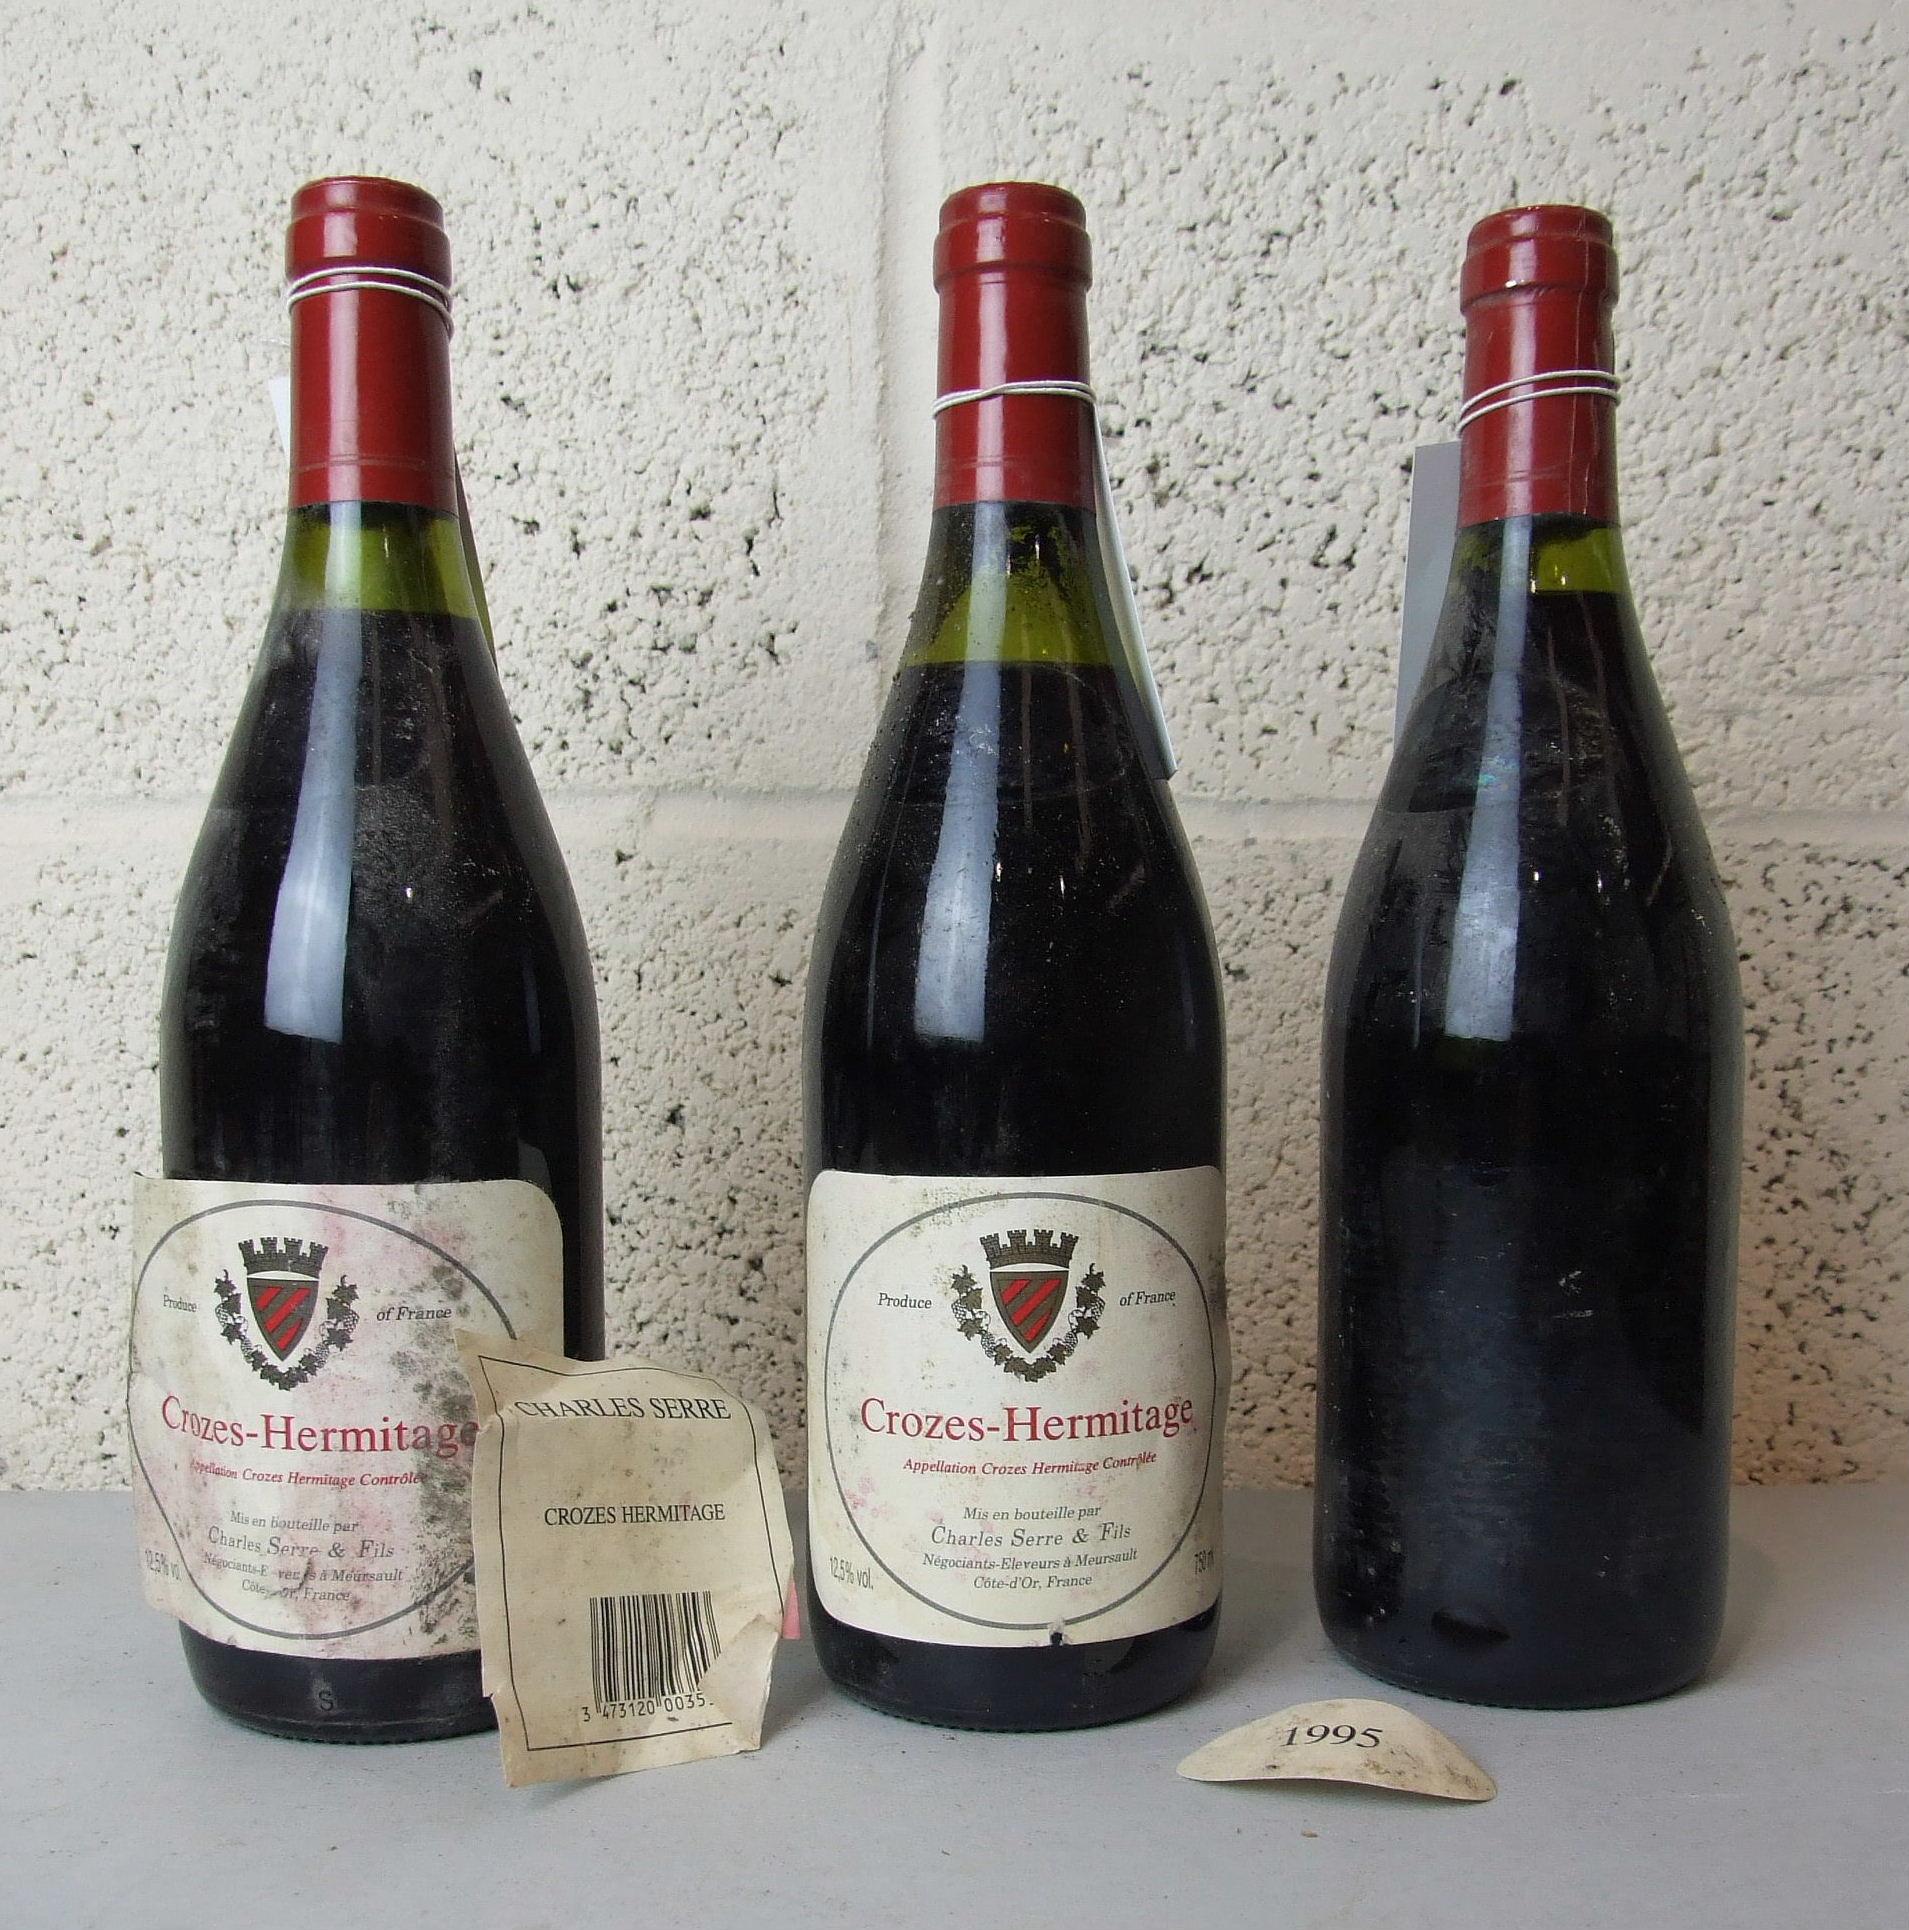 Lot 22 - France, Crozes Hermitage, Charles Serre 1995, low neck levels, one label damaged, three bottles, (